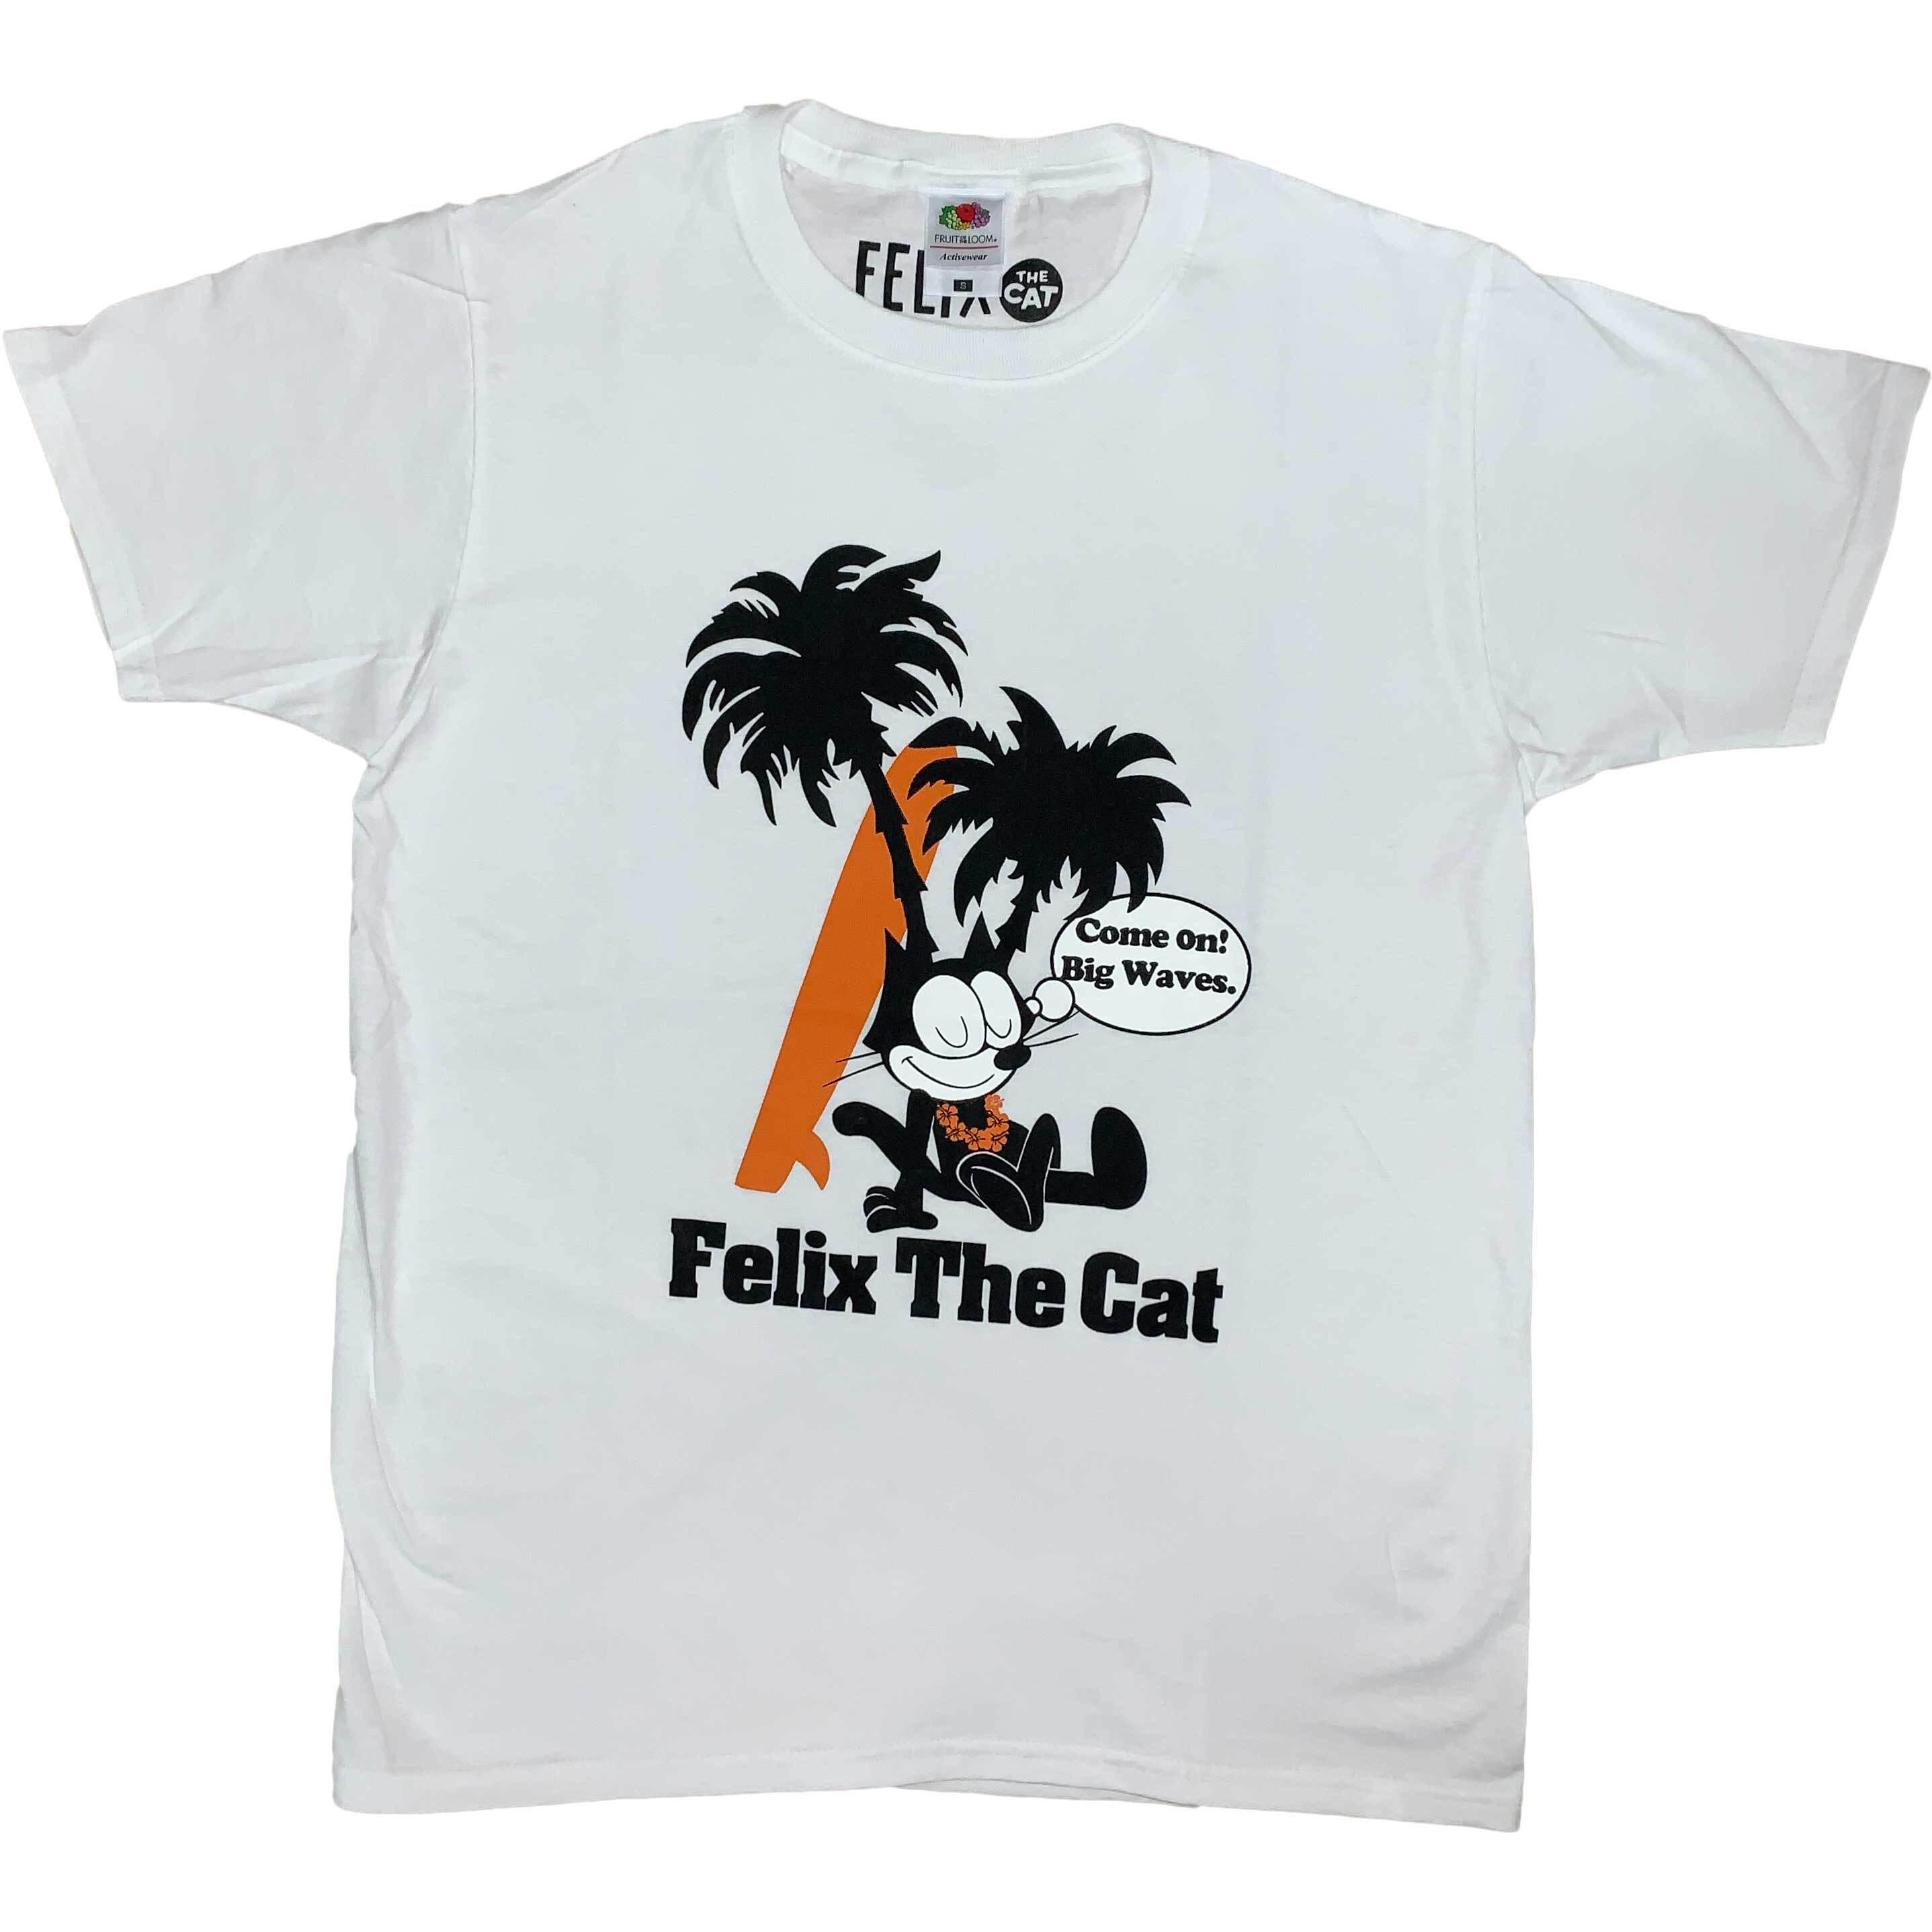 [FELIX]フィリックス・ザ・キャット・ハワイアン・Tシャツ(丸首)・フルーツオブザルームボディJ3930HD - Dream (ドリーム)